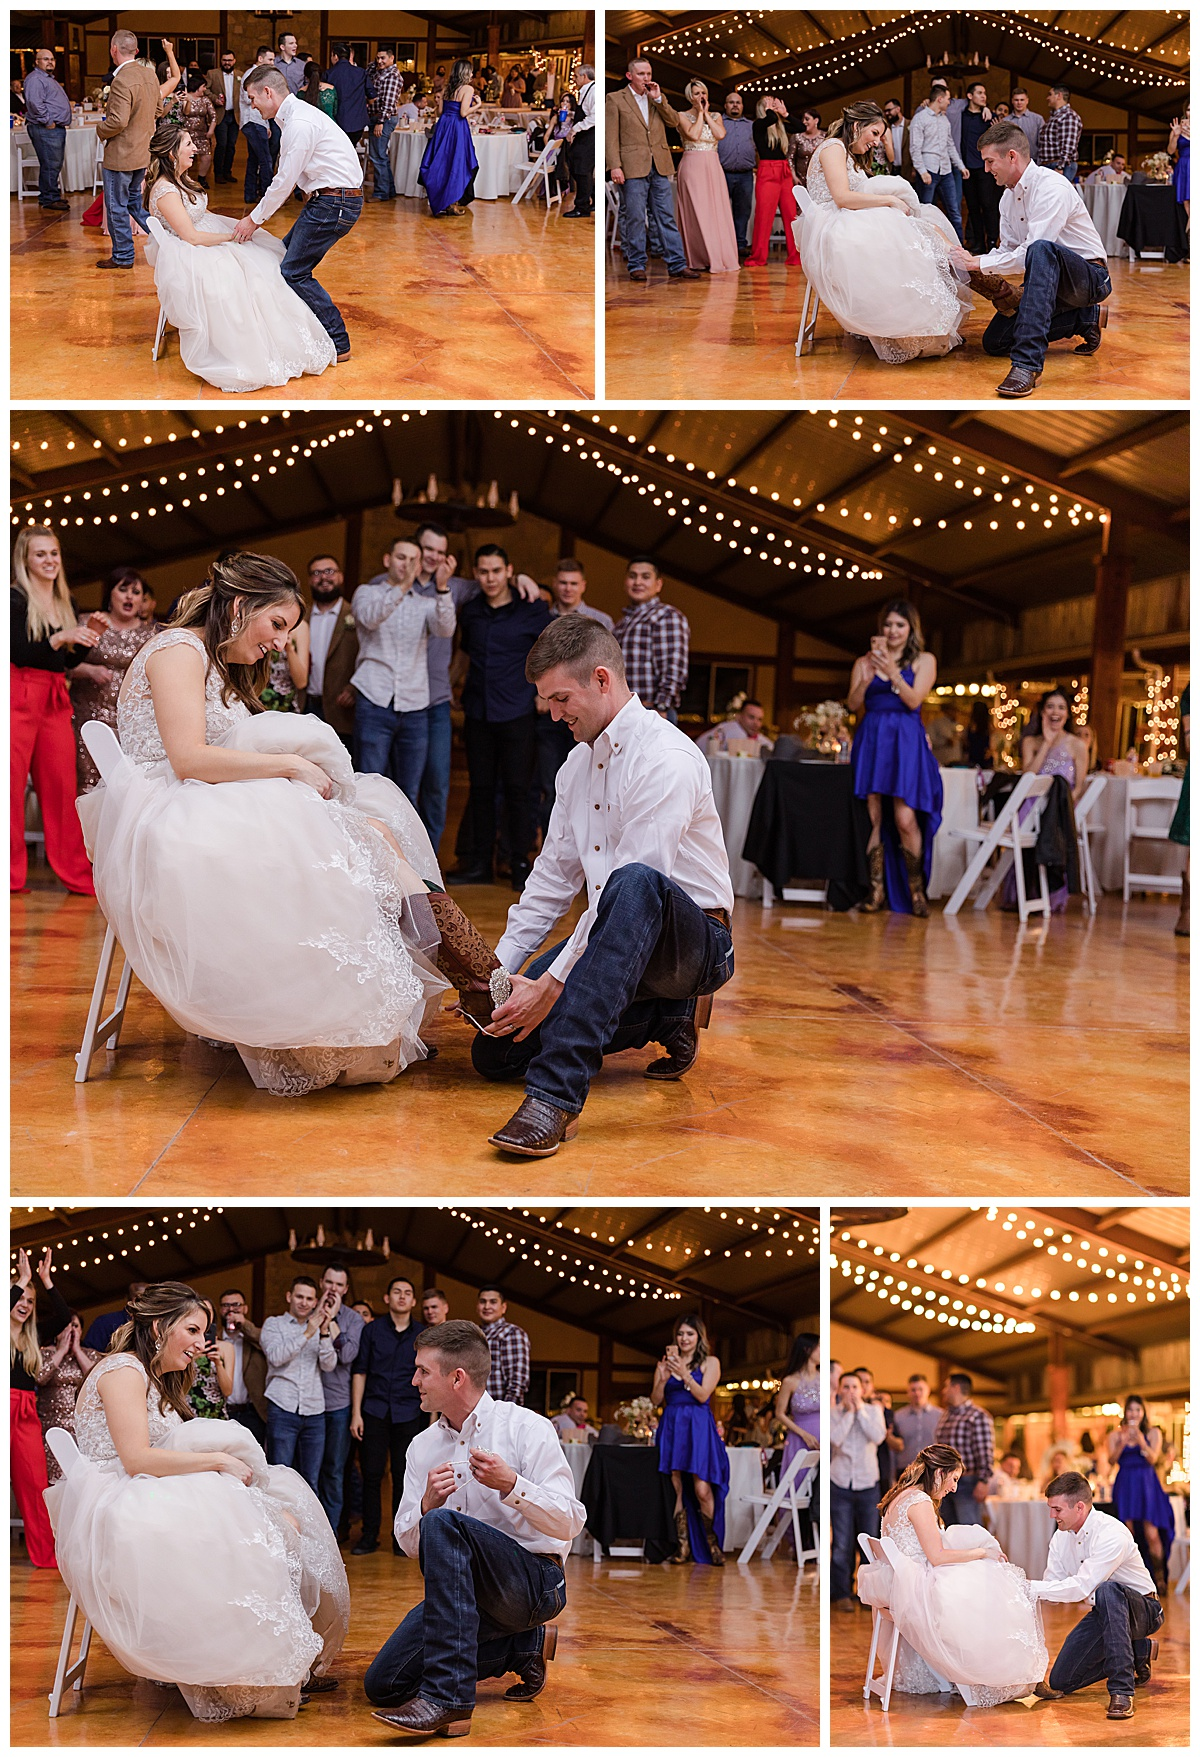 Wedding-Photographer-Texas-Hill-Country-Happy-H-Ranch-Comfor-Texas-Carly-Barton-Photography_0088.jpg